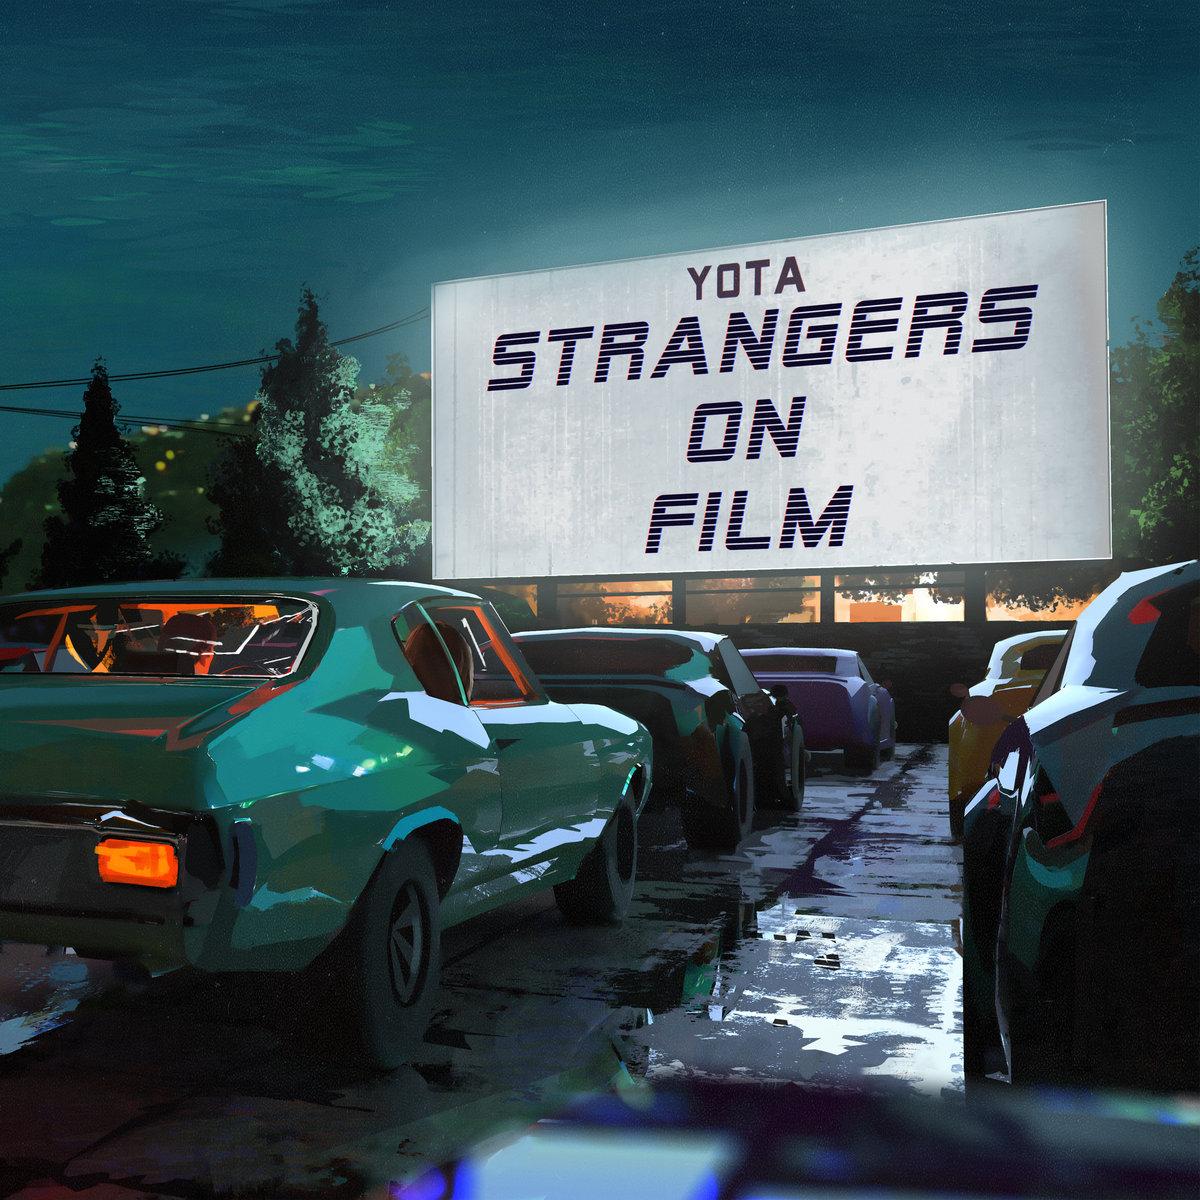 a3386304441 10 1 - Yota - Strangers on Film